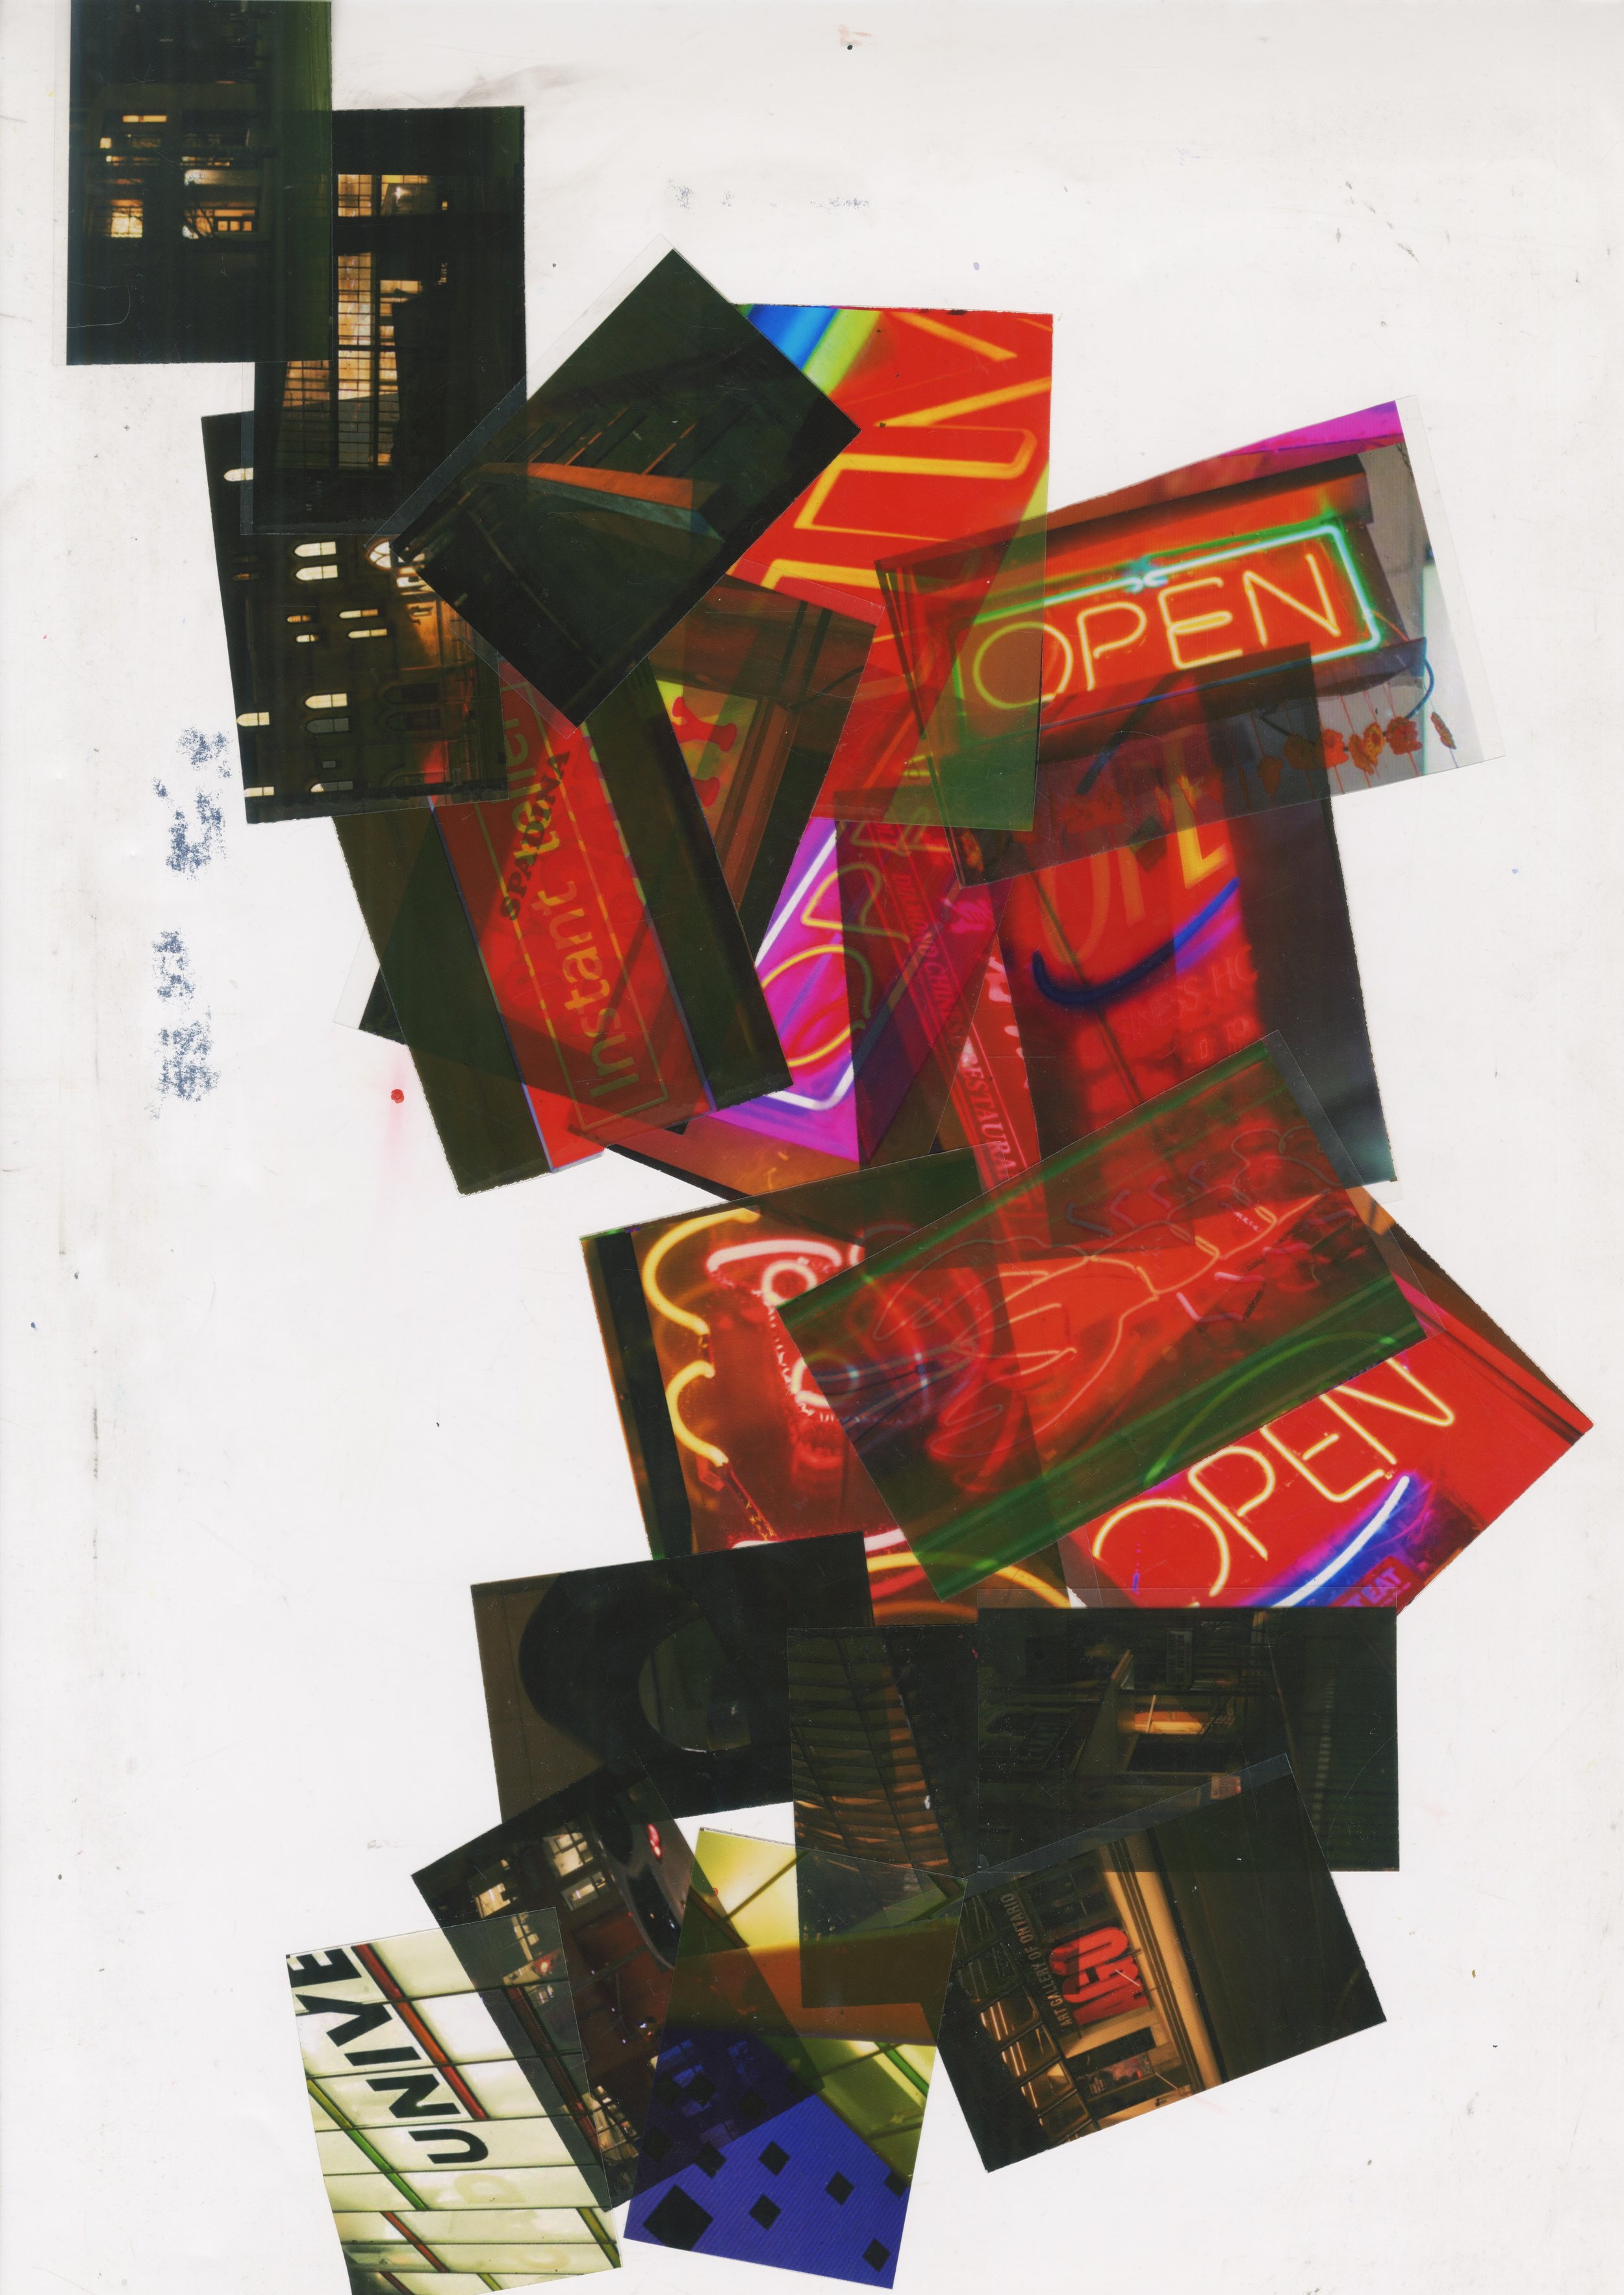 Jan 30th chinatown scans.jpeg